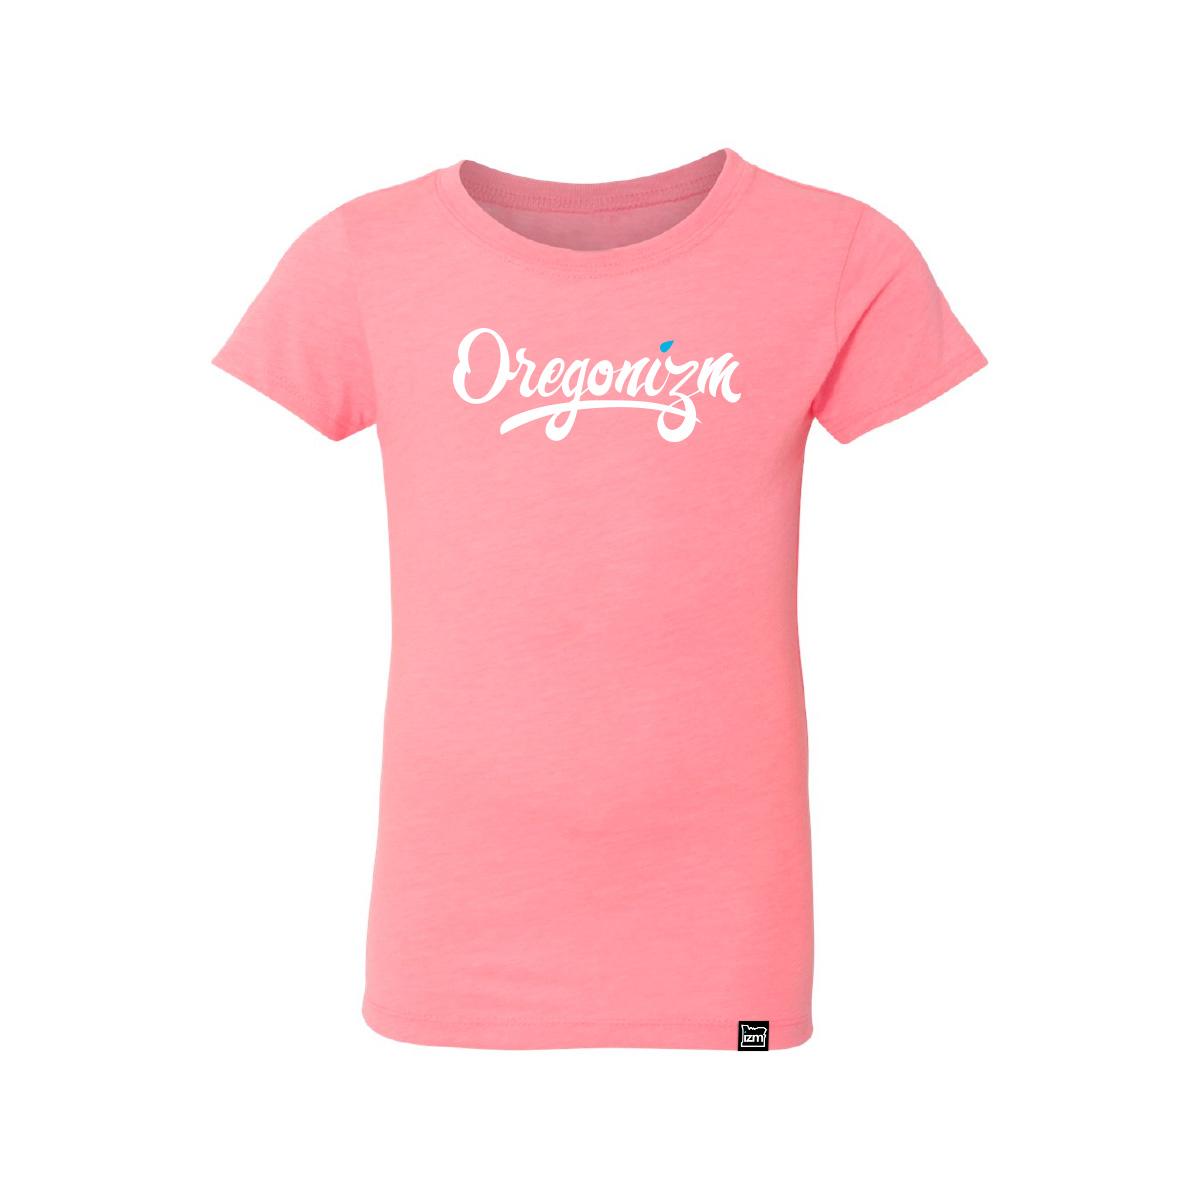 izm-productimage-youth-girls-script-pink